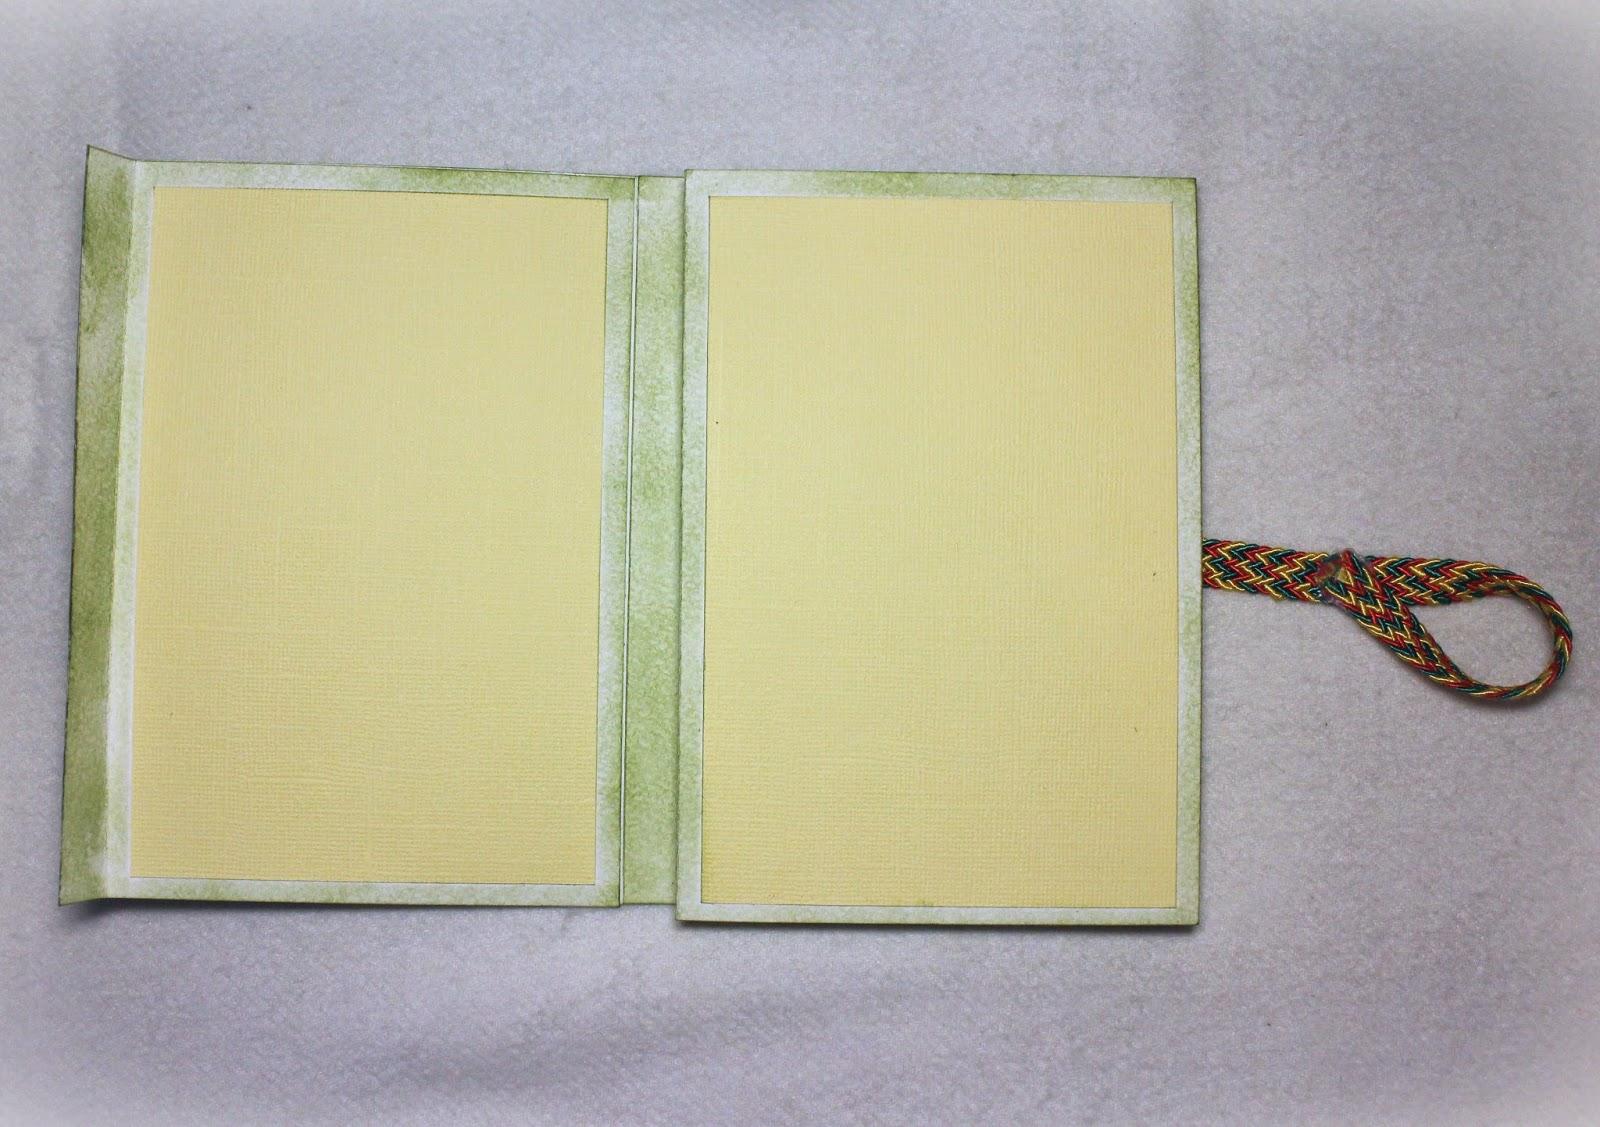 mini album scrapbooking scrapbook butterfly memories бабочка миник воспоминания скрапбукинг мини-альбом hamster-sensey